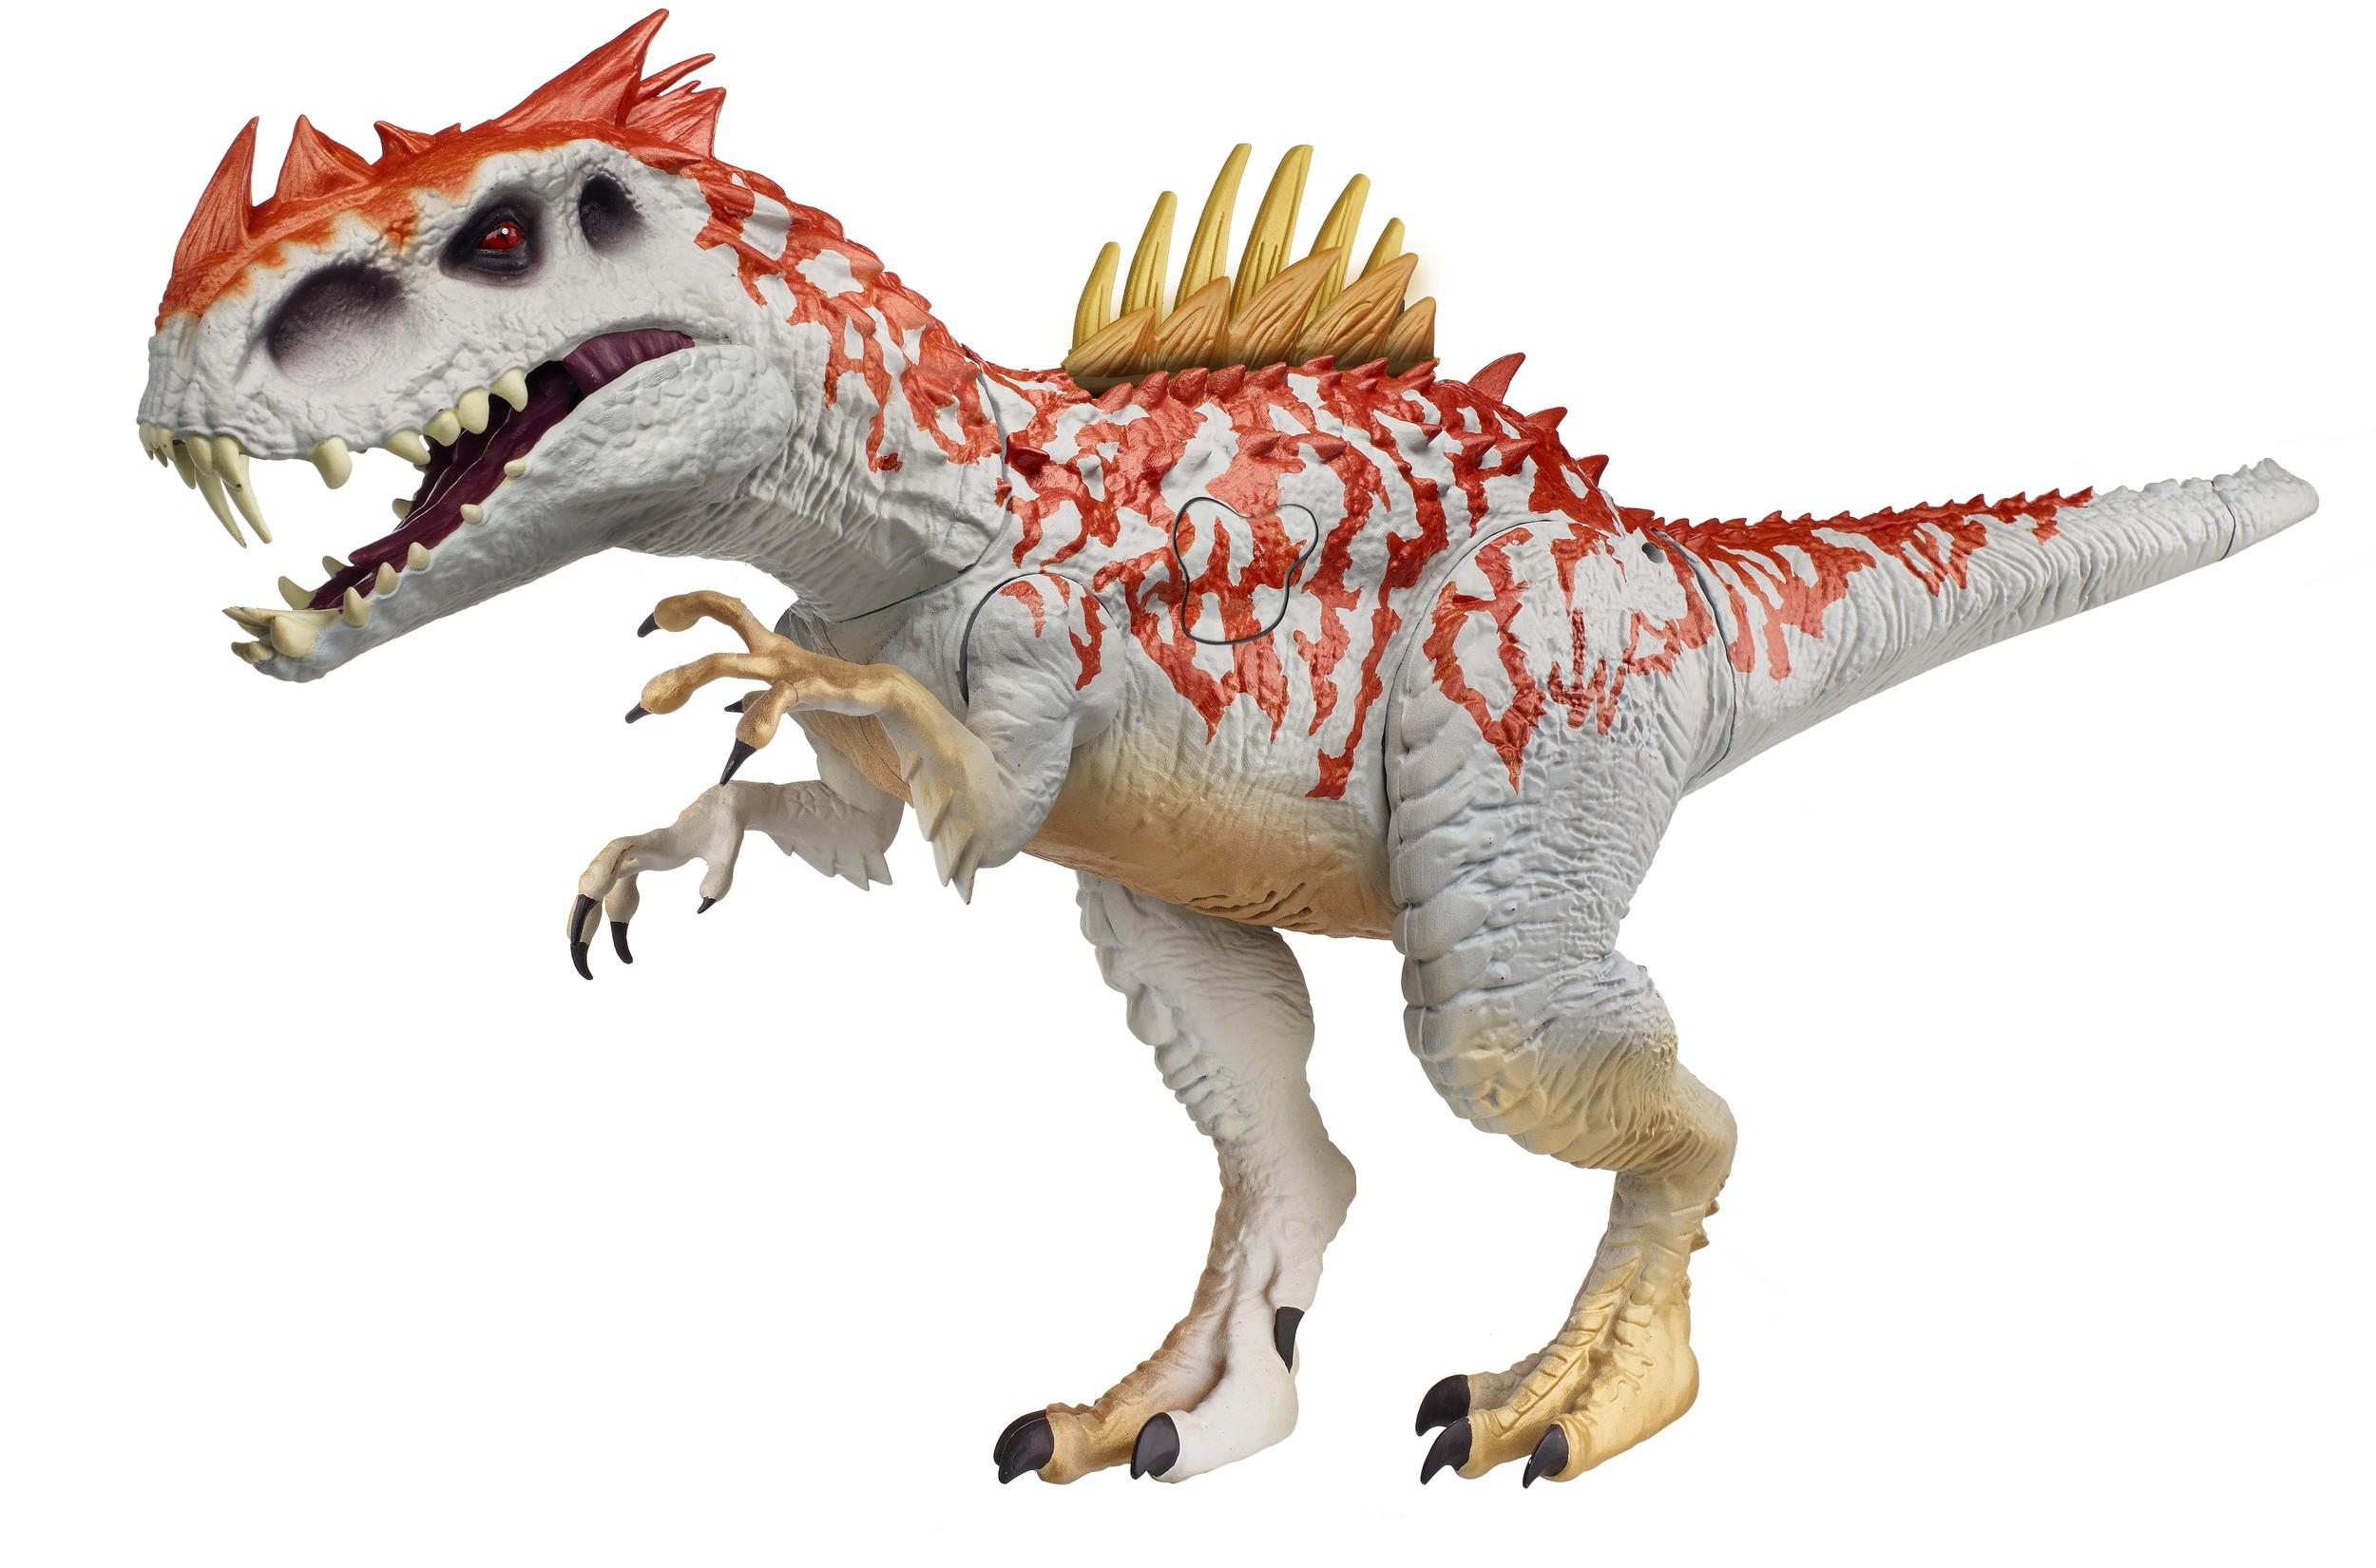 Jursassic_World_Indominus_Rex_Hybrid_Dino_Figure.jpg